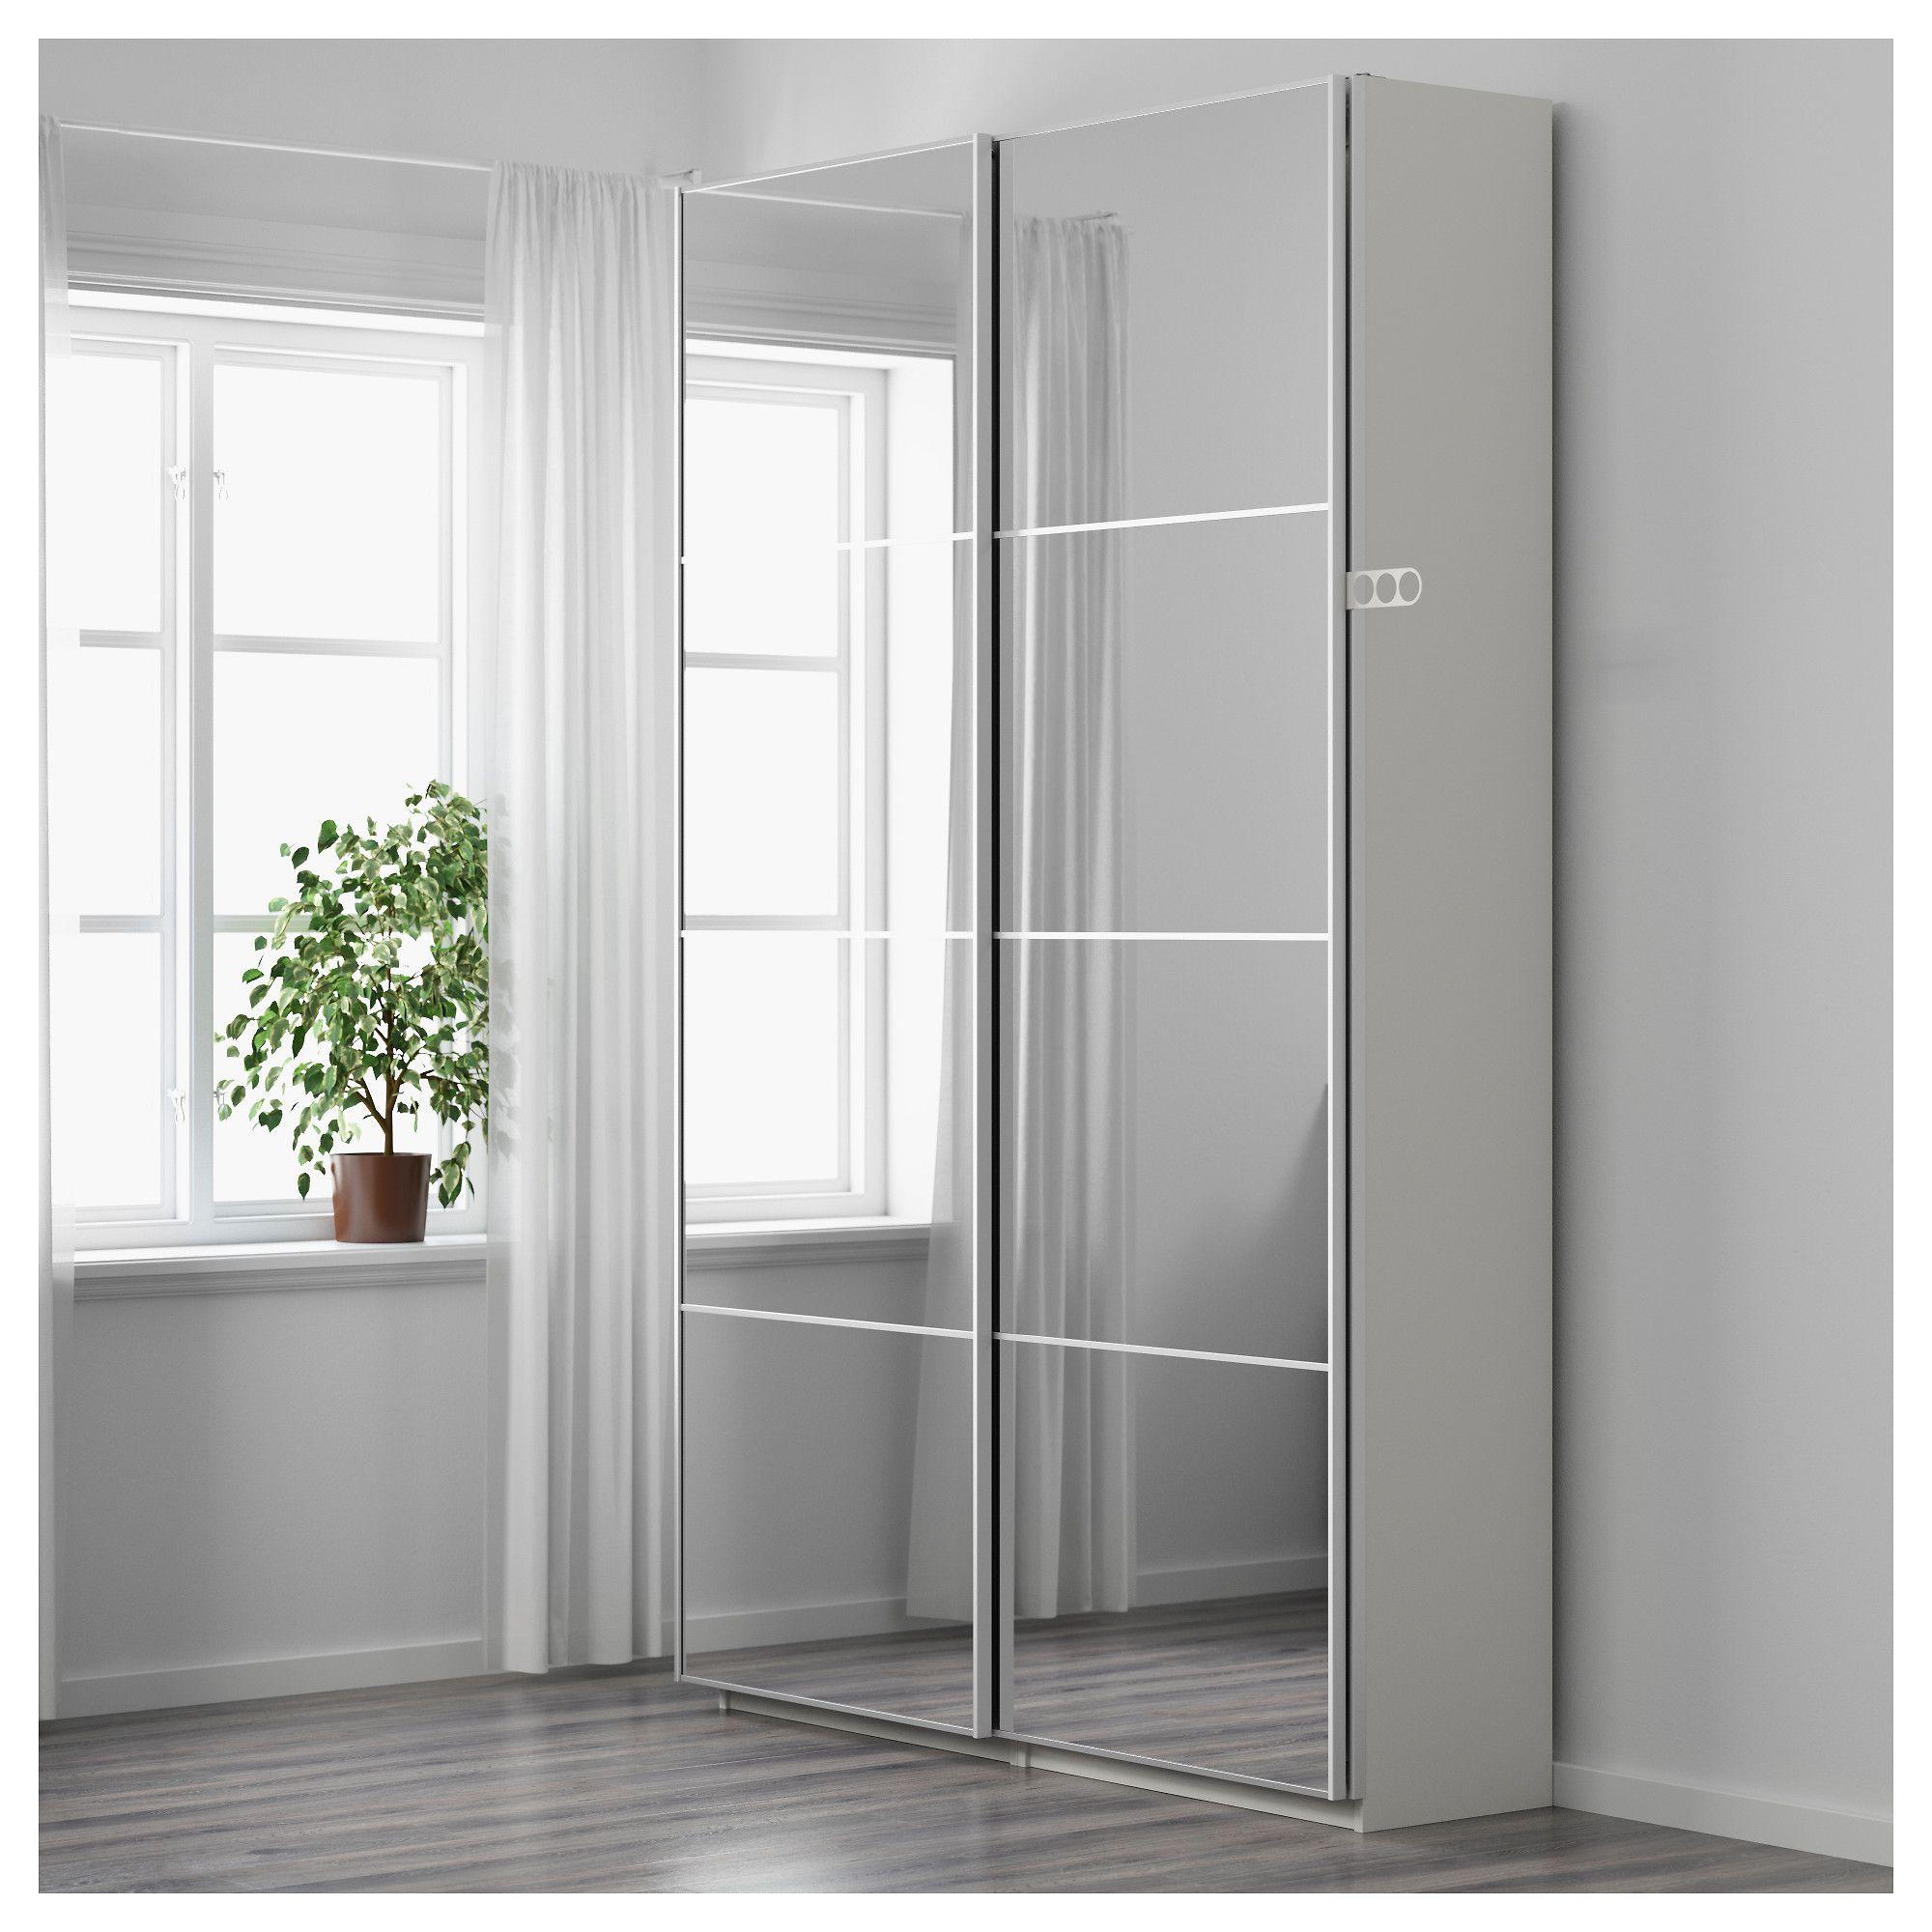 IKEA PAX corner wardrobe Article Number 999.060.32